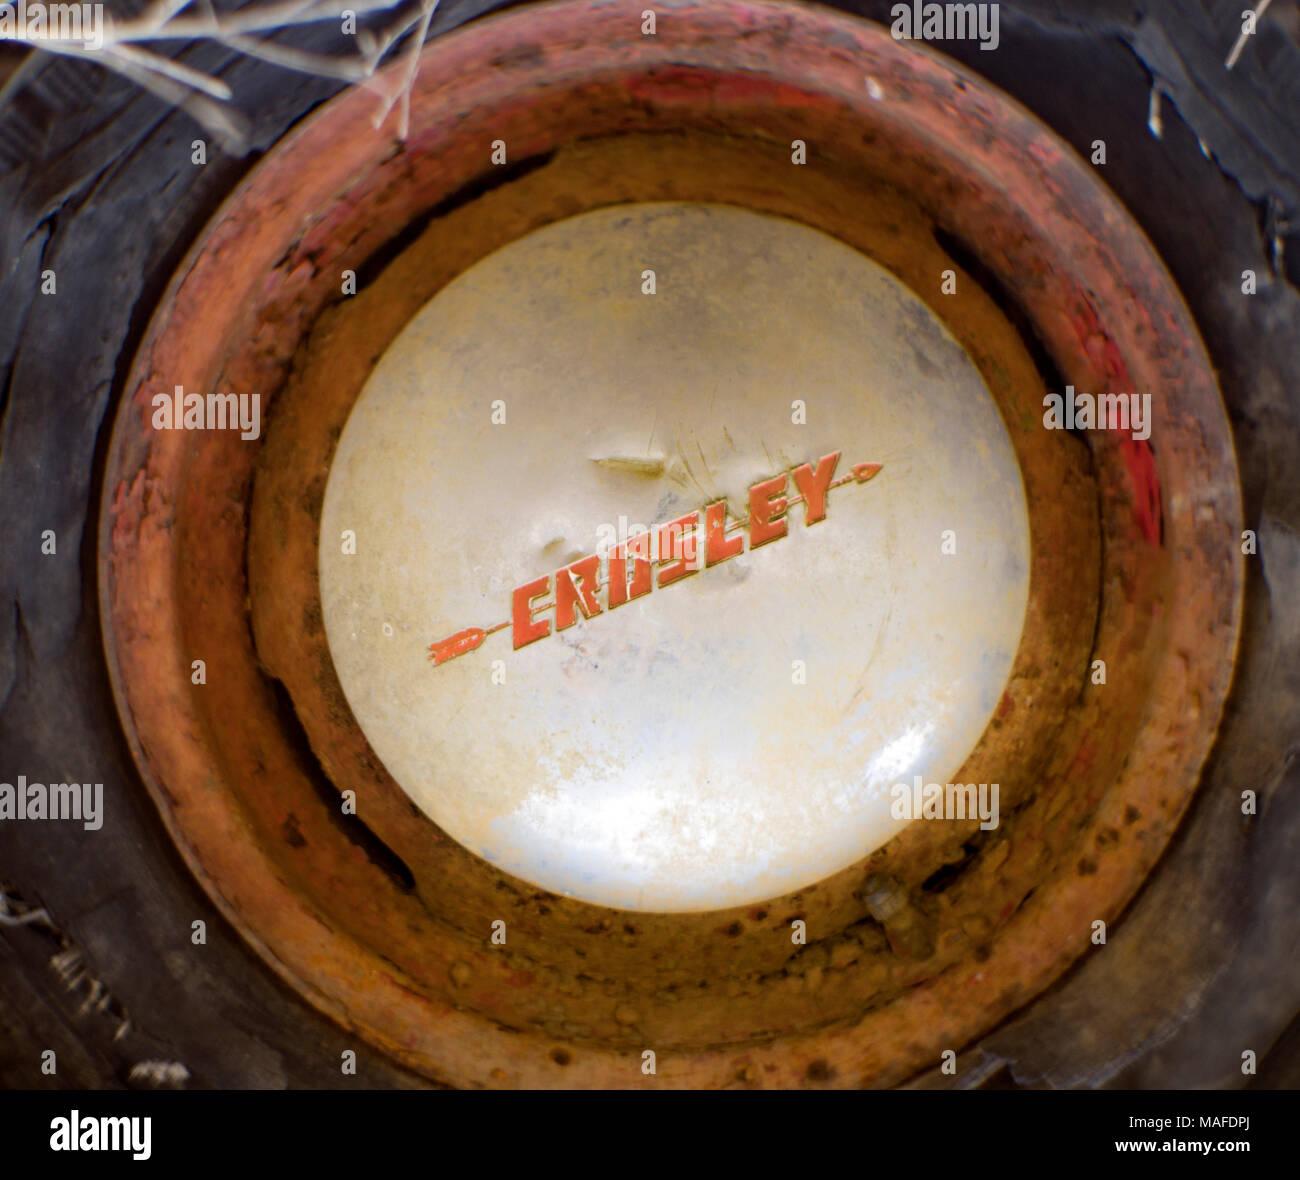 Wheel Hub Cap Stockfotos & Wheel Hub Cap Bilder - Alamy